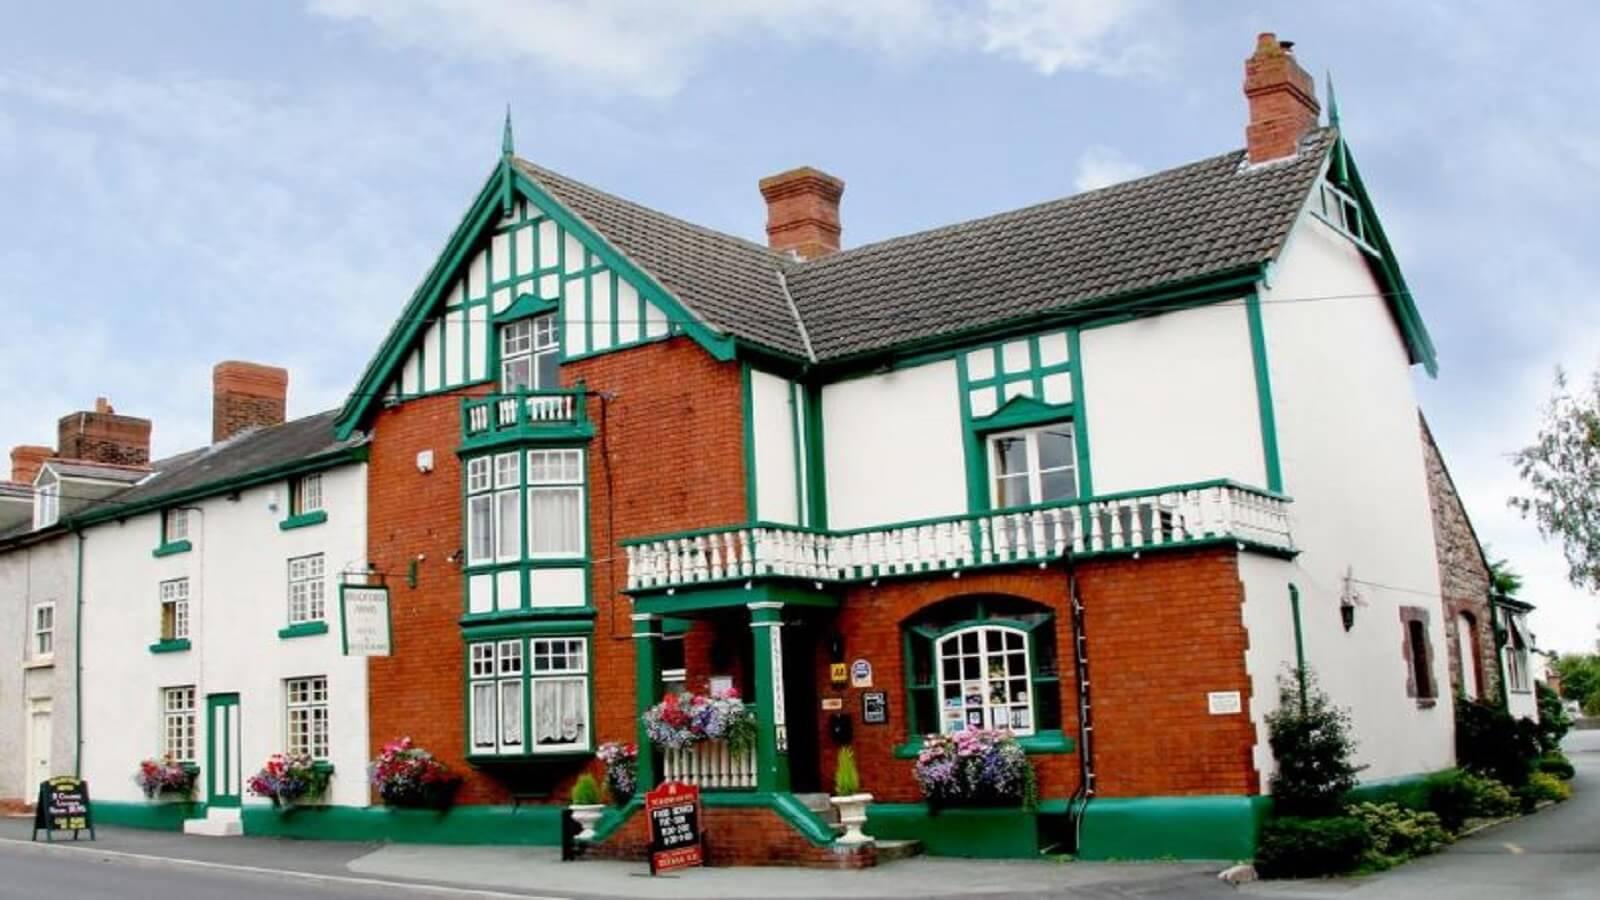 The Bradford Arms Hotel